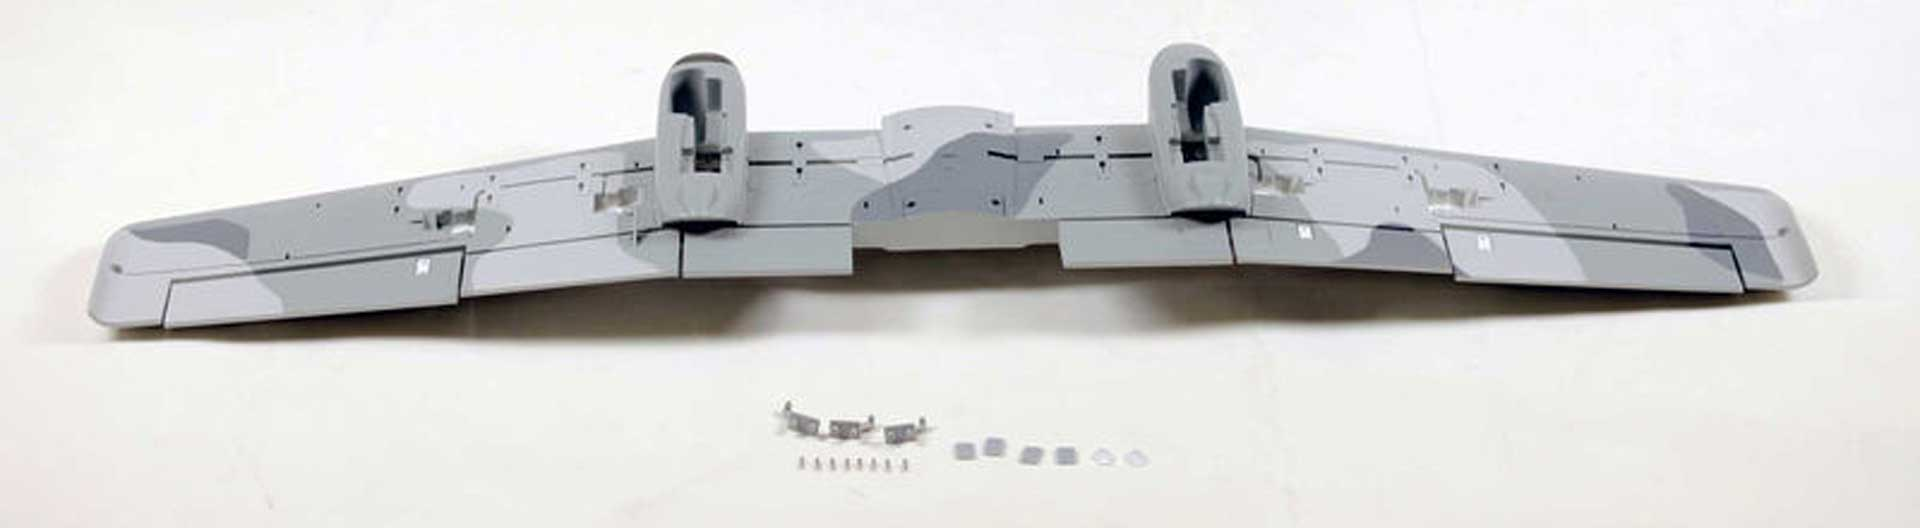 E-Flite Wing: A-10 Thunderbolt II 64mm EDF